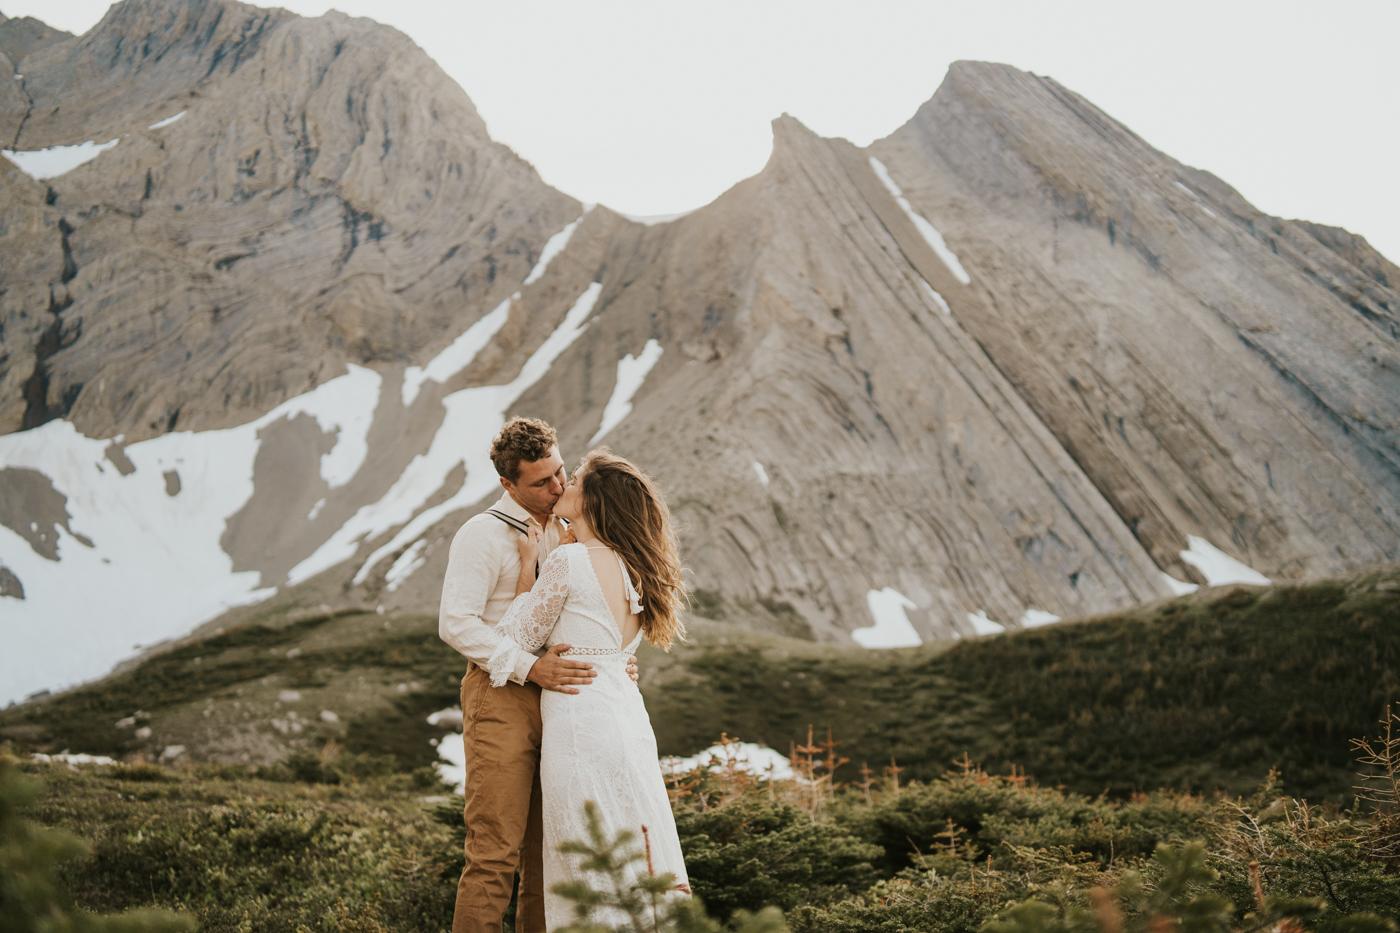 tyraephotography_photographer_wedding_elopement_engagement_photography-07987.jpg